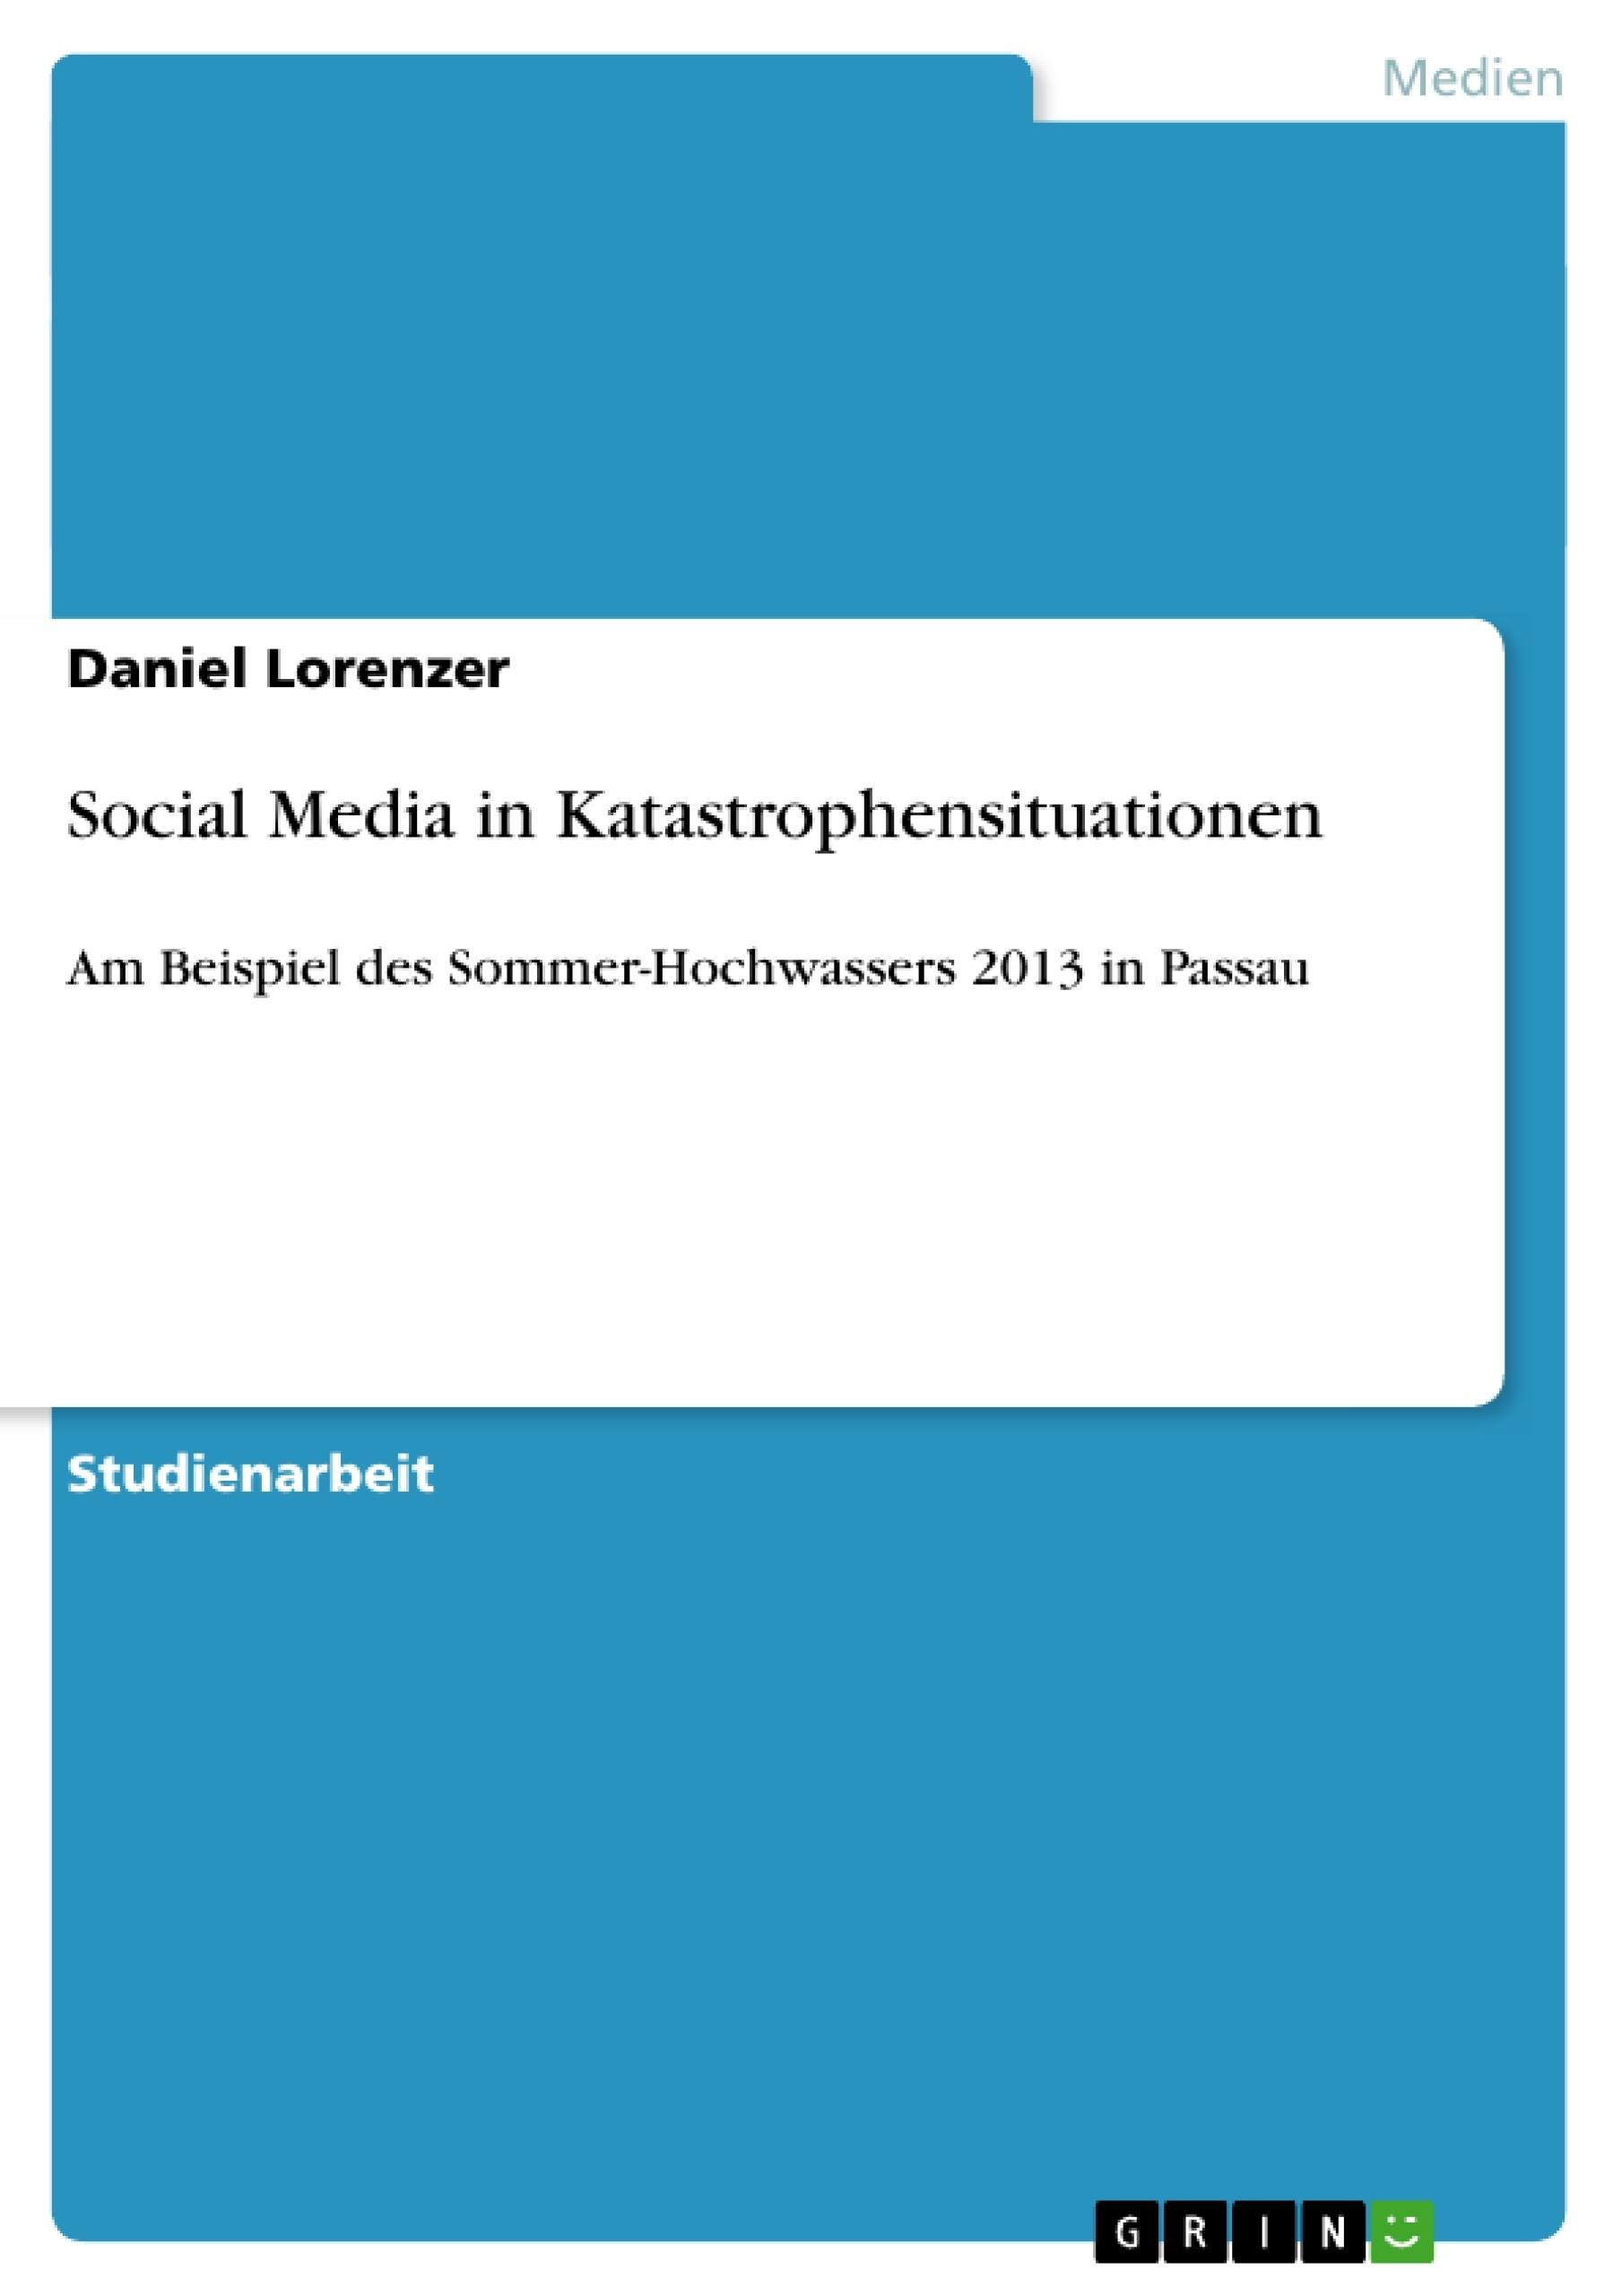 Titel: Social Media in Katastrophensituationen